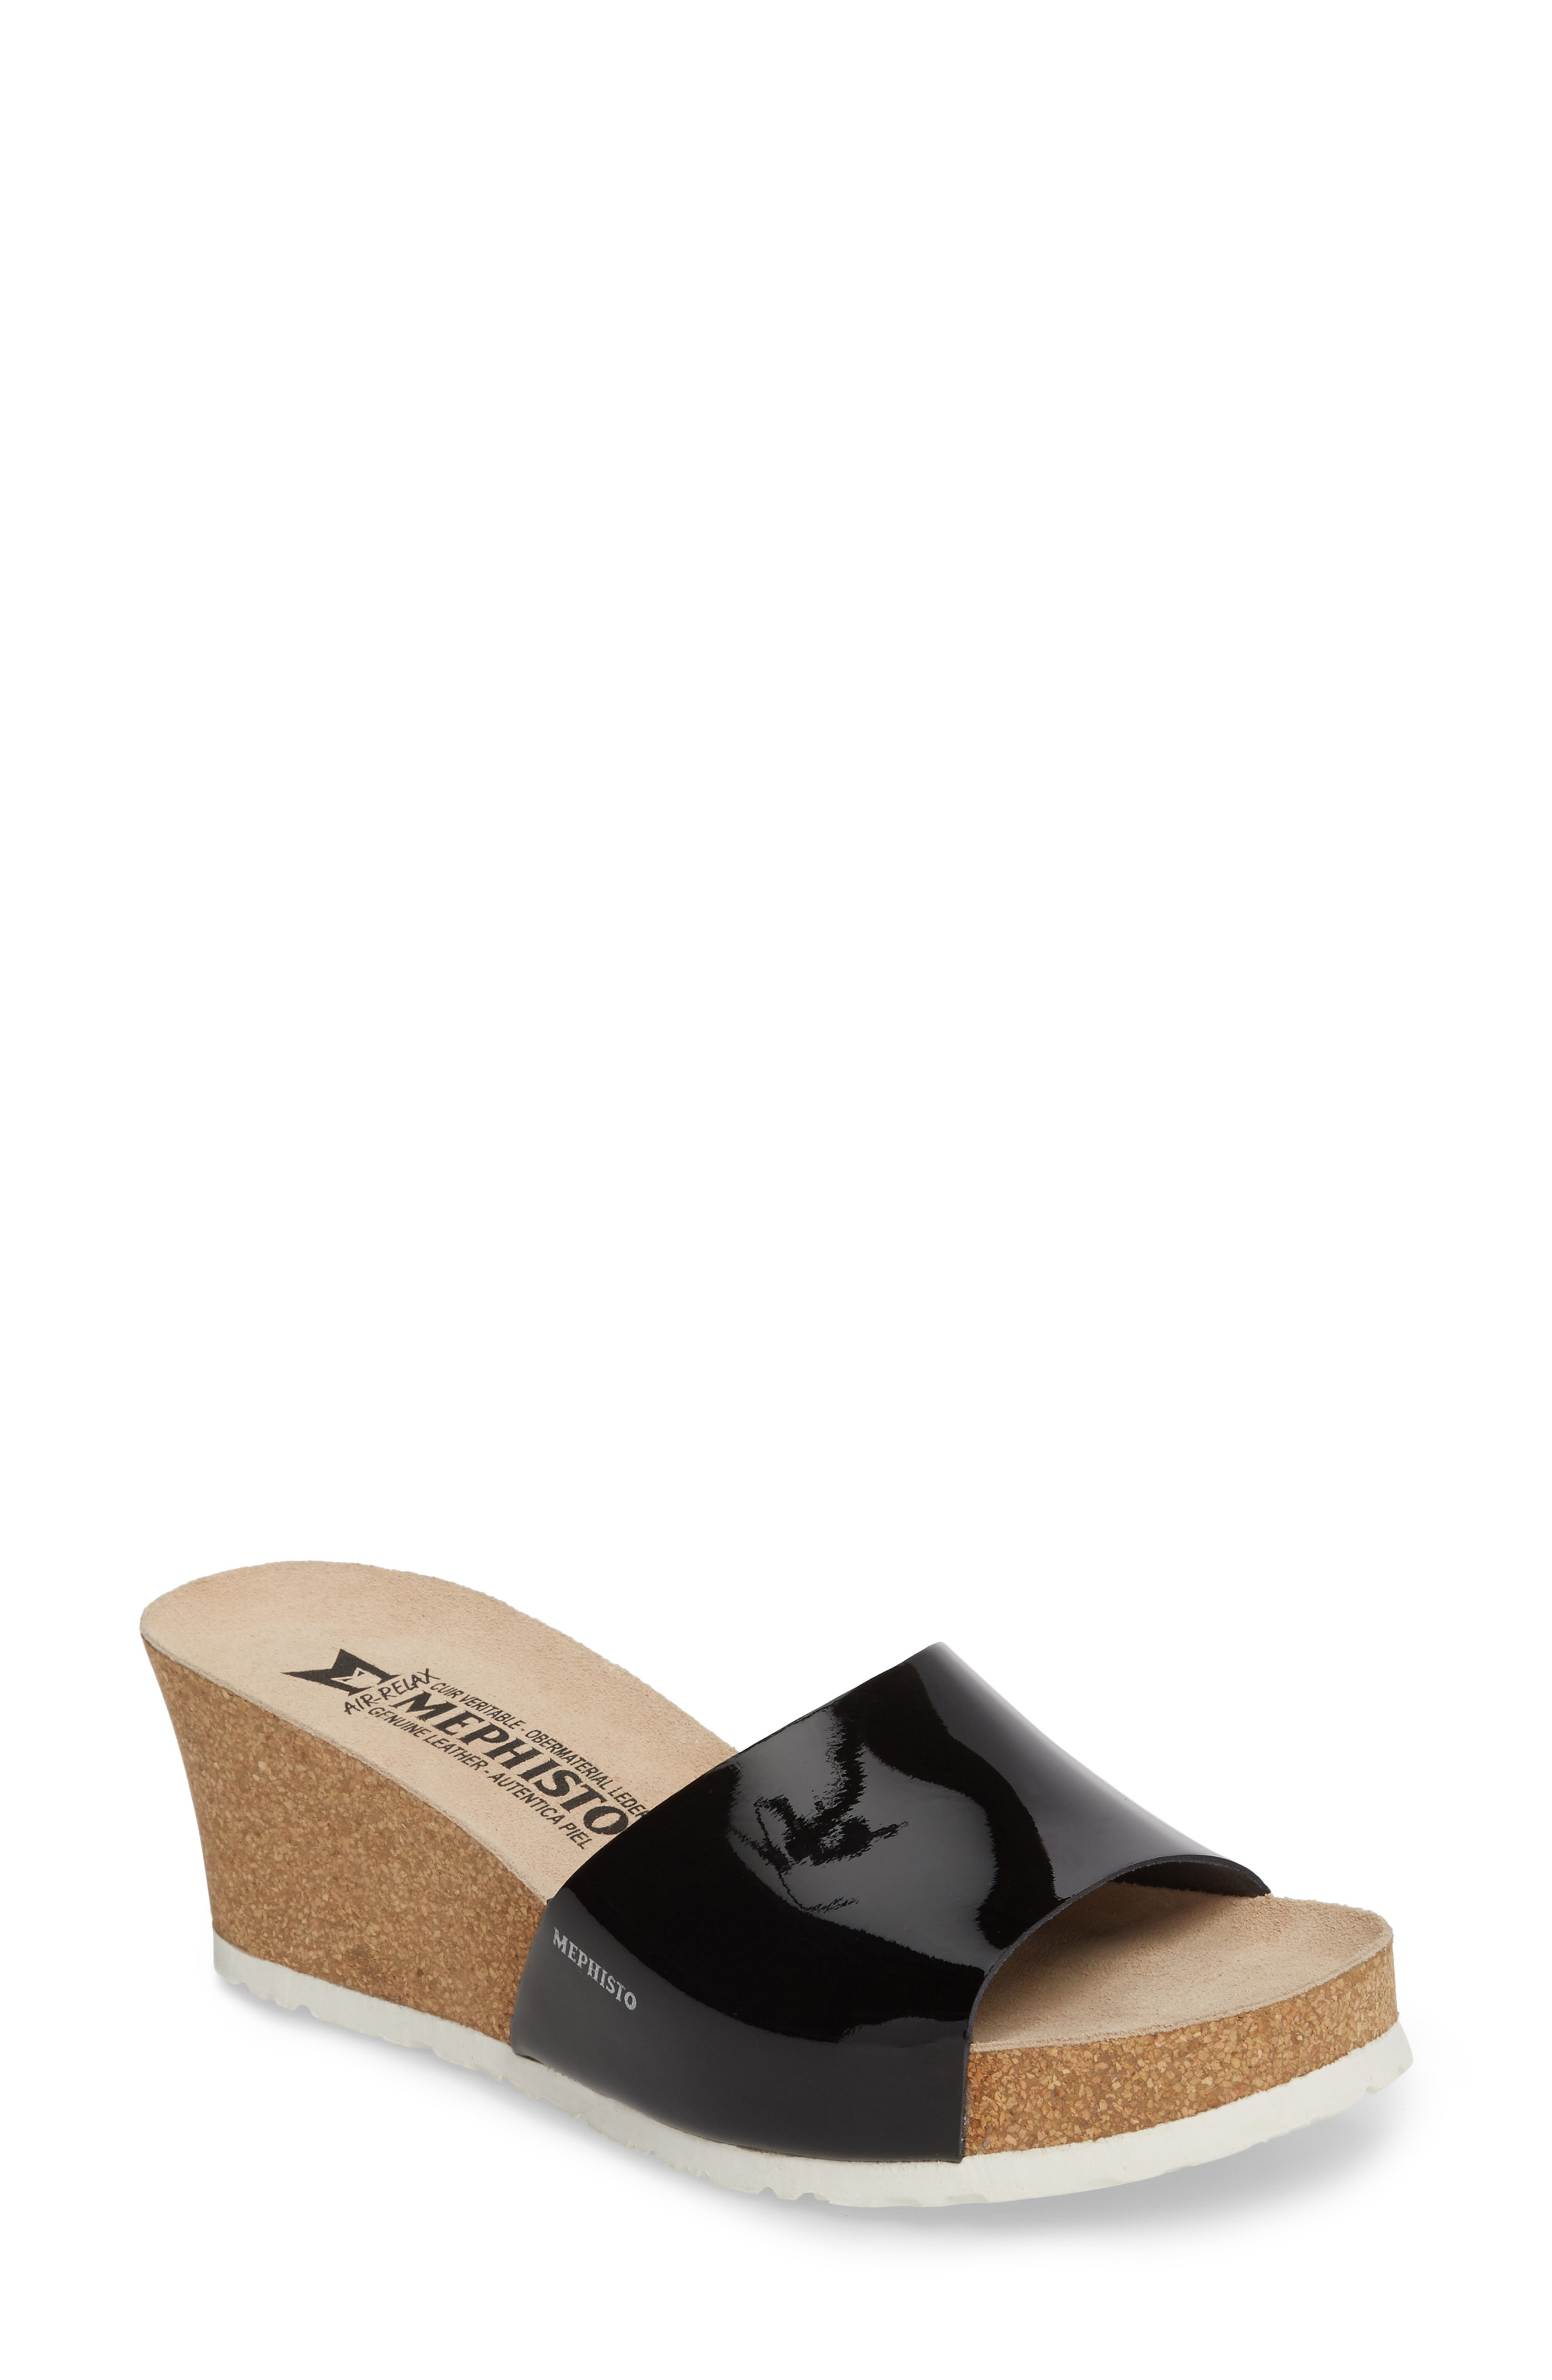 07e2224874f Mephisto Lise Platform Wedge Sandal In Platinum Leather